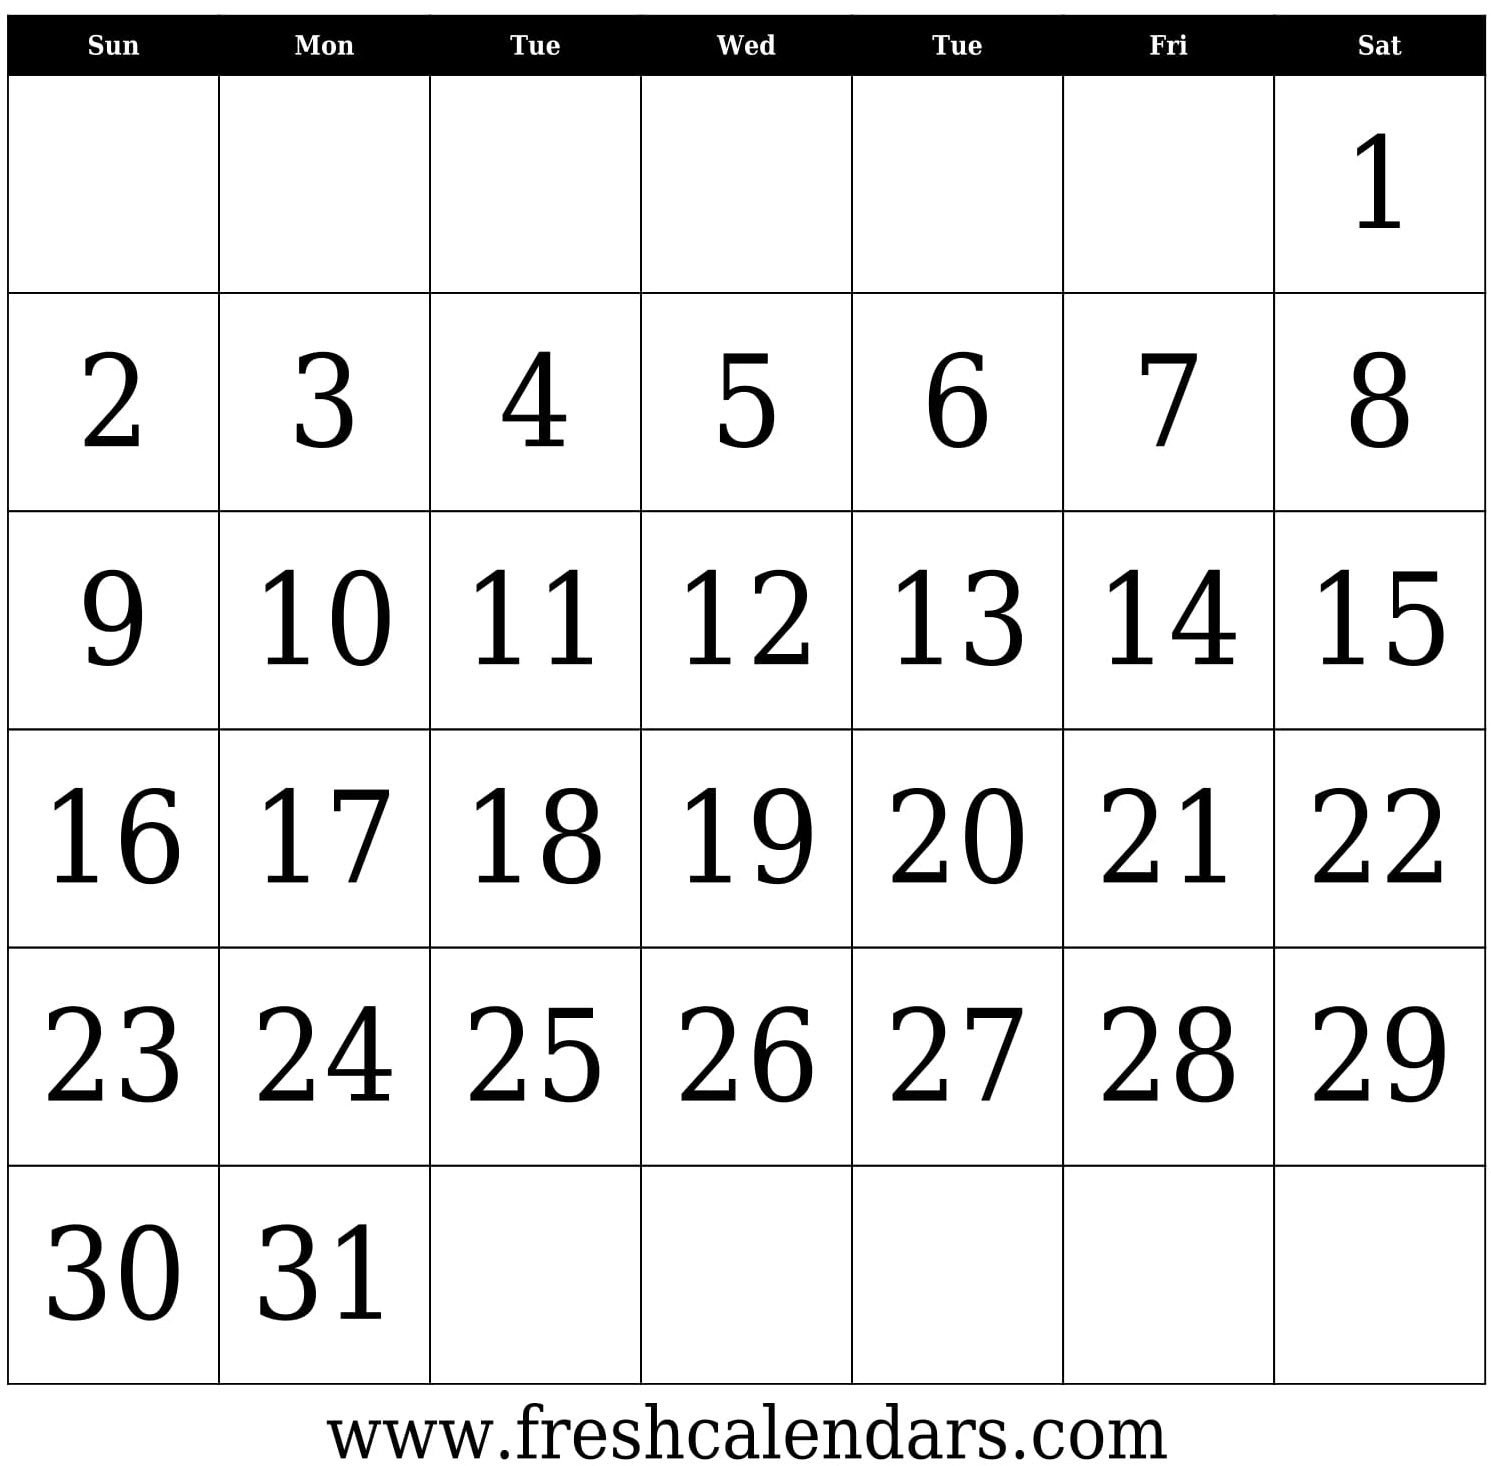 Calendar Numbers Printable 131 :Free Calendar Template pertaining to Printable Numbers 1-31